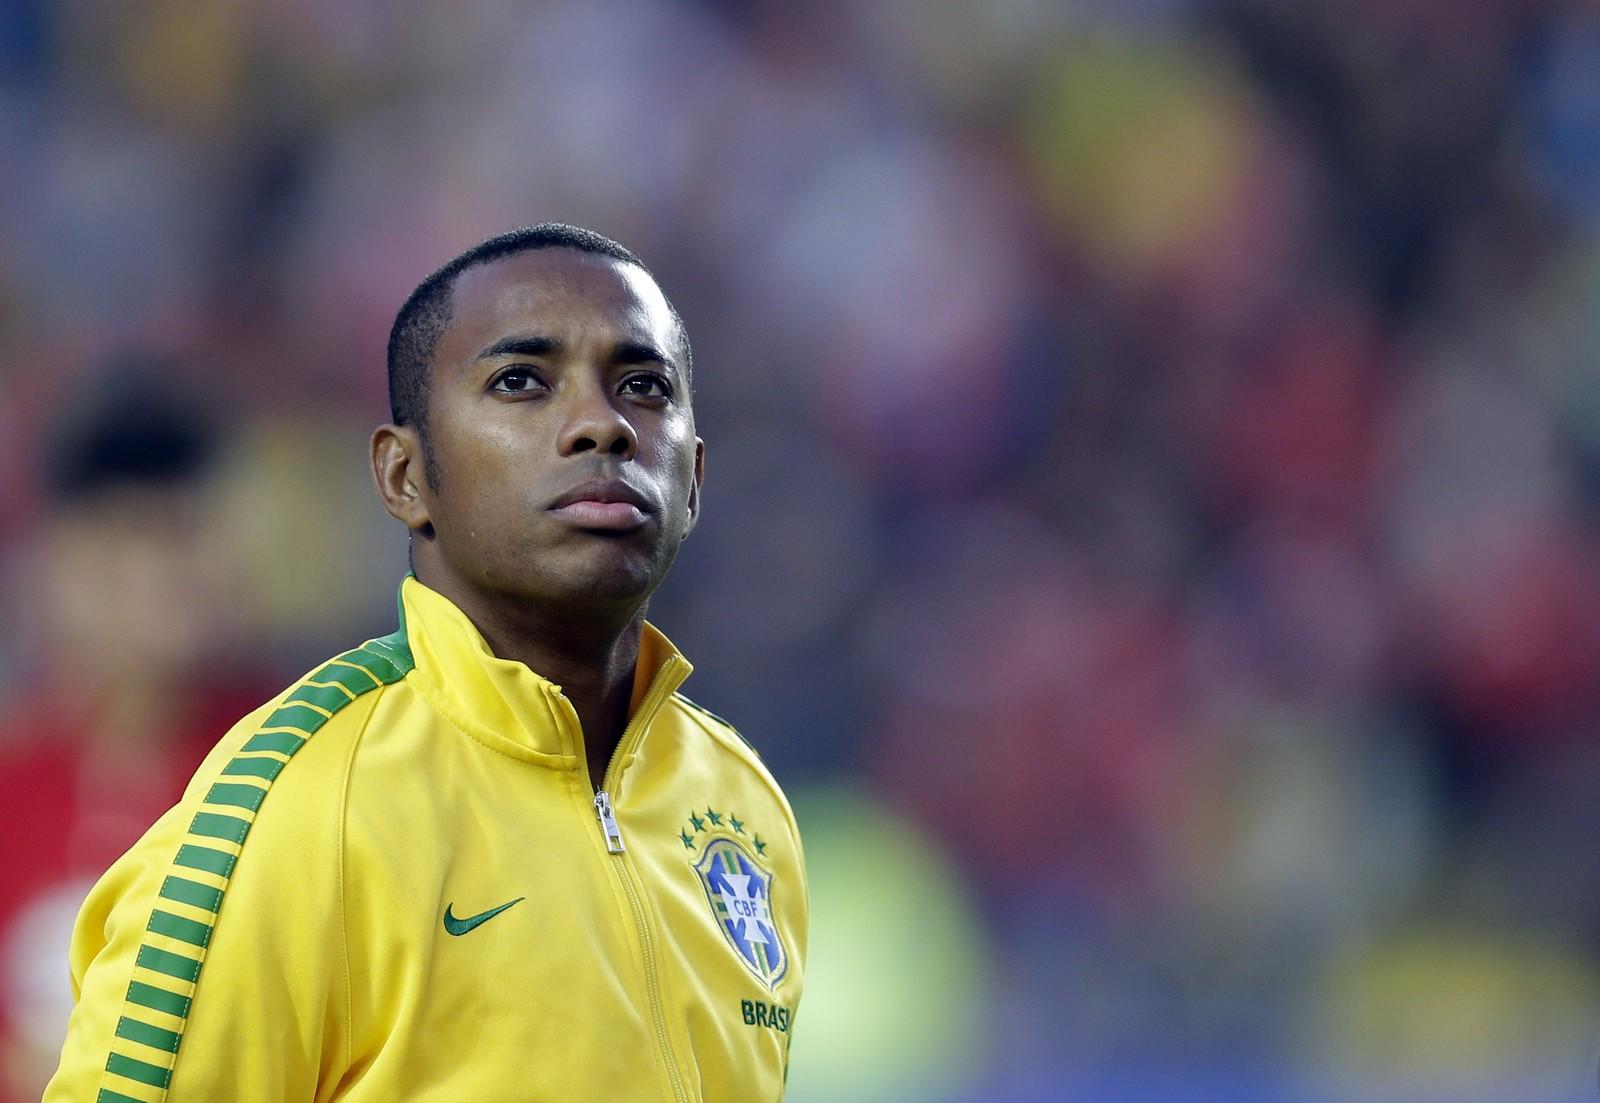 Robinho entra na mira do São Paulo fe537b6581beb